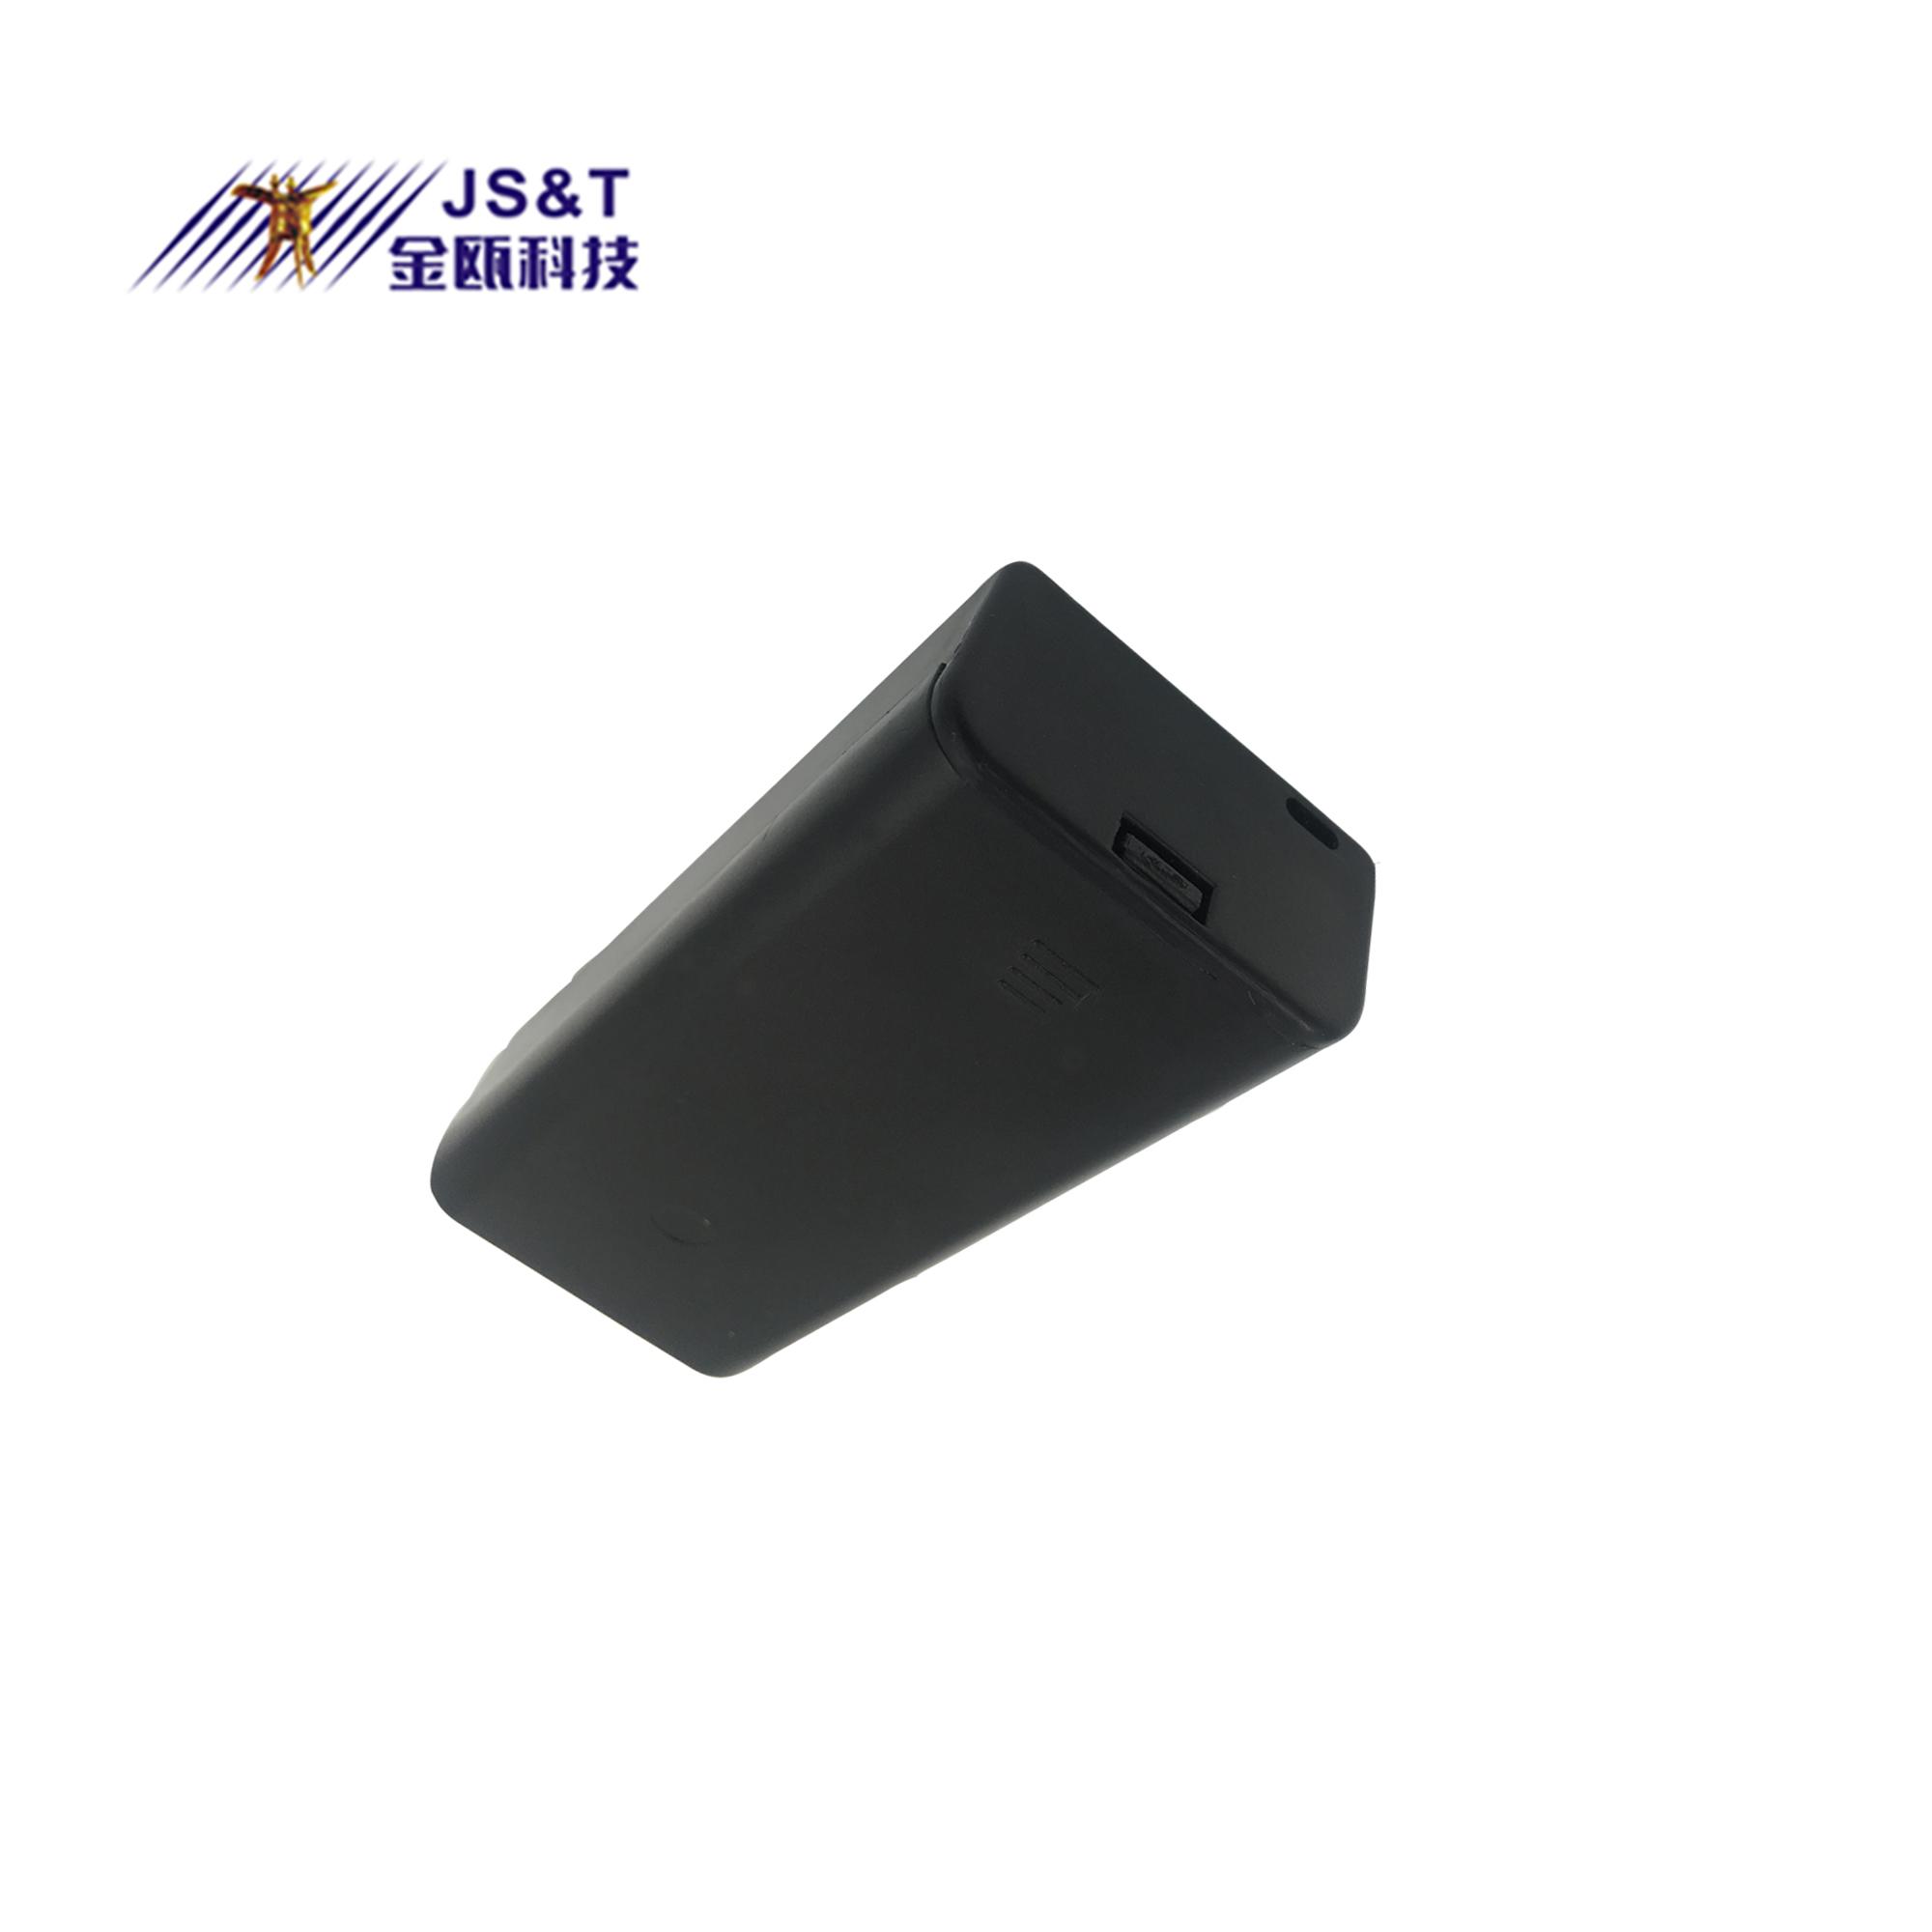 Bluetooth 4 0 Ble 4 1 Farol Ibeacon Cc2540 Cc2541 Eddystone Ibeacon Programável 2 Pilhas Aa Bateria De Longa Duração Vida Buy Ibeacon Beacon Programável Beacon Beacon Ble Product On Alibaba Com